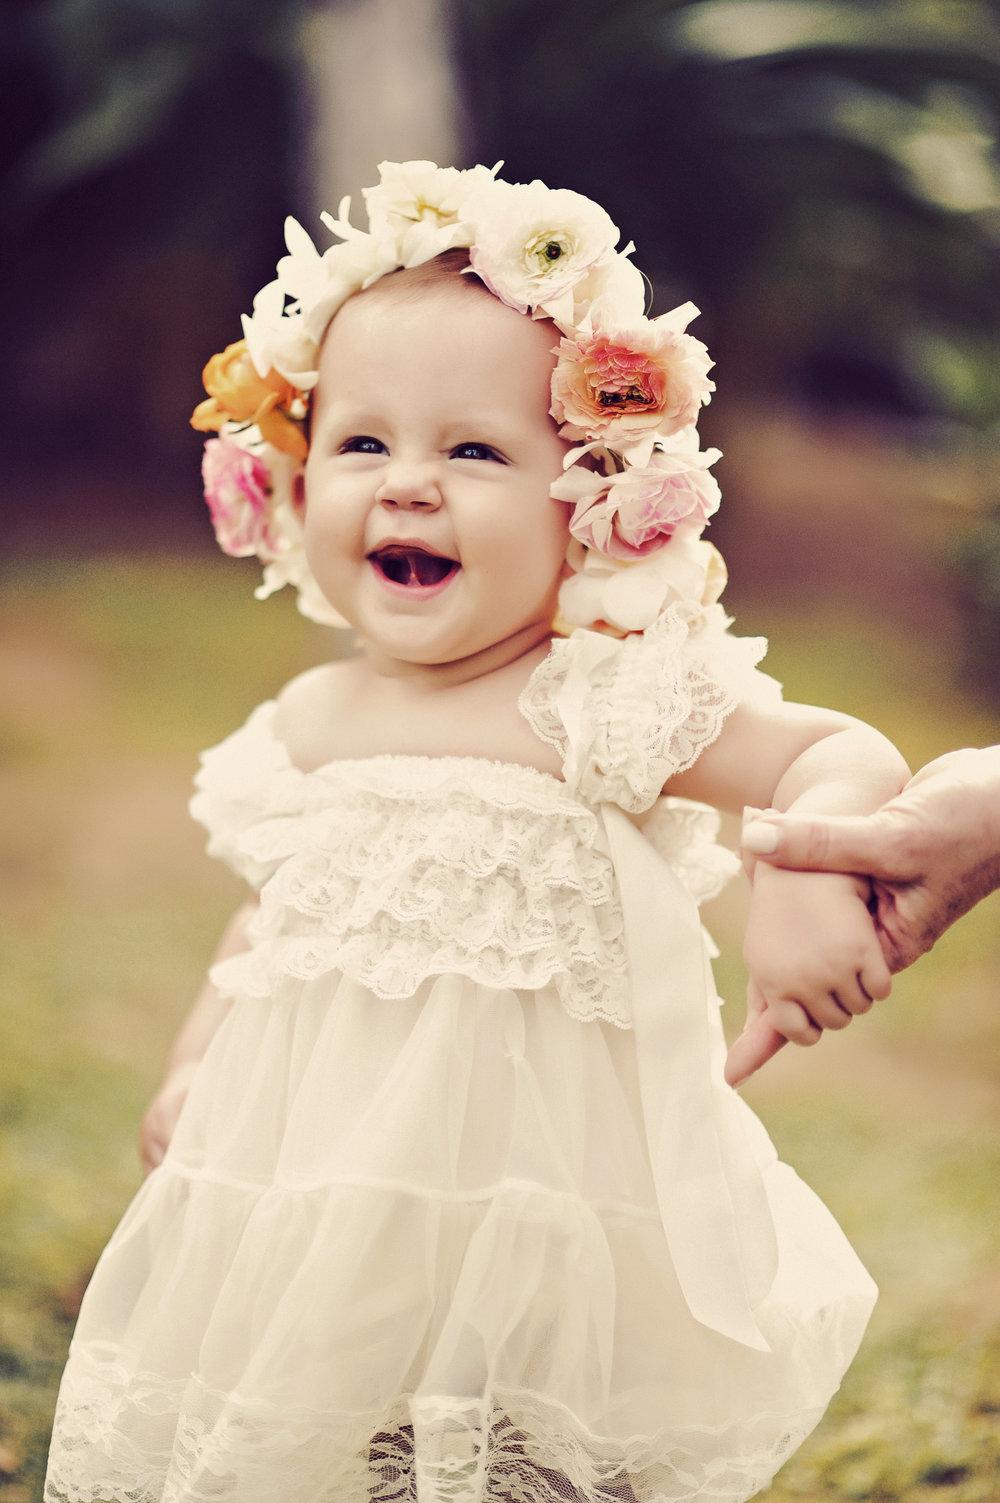 viola_knight_flowergirl_maui_mickelsonsgetmauid_aspiringkennedy_tamizphotograhpy